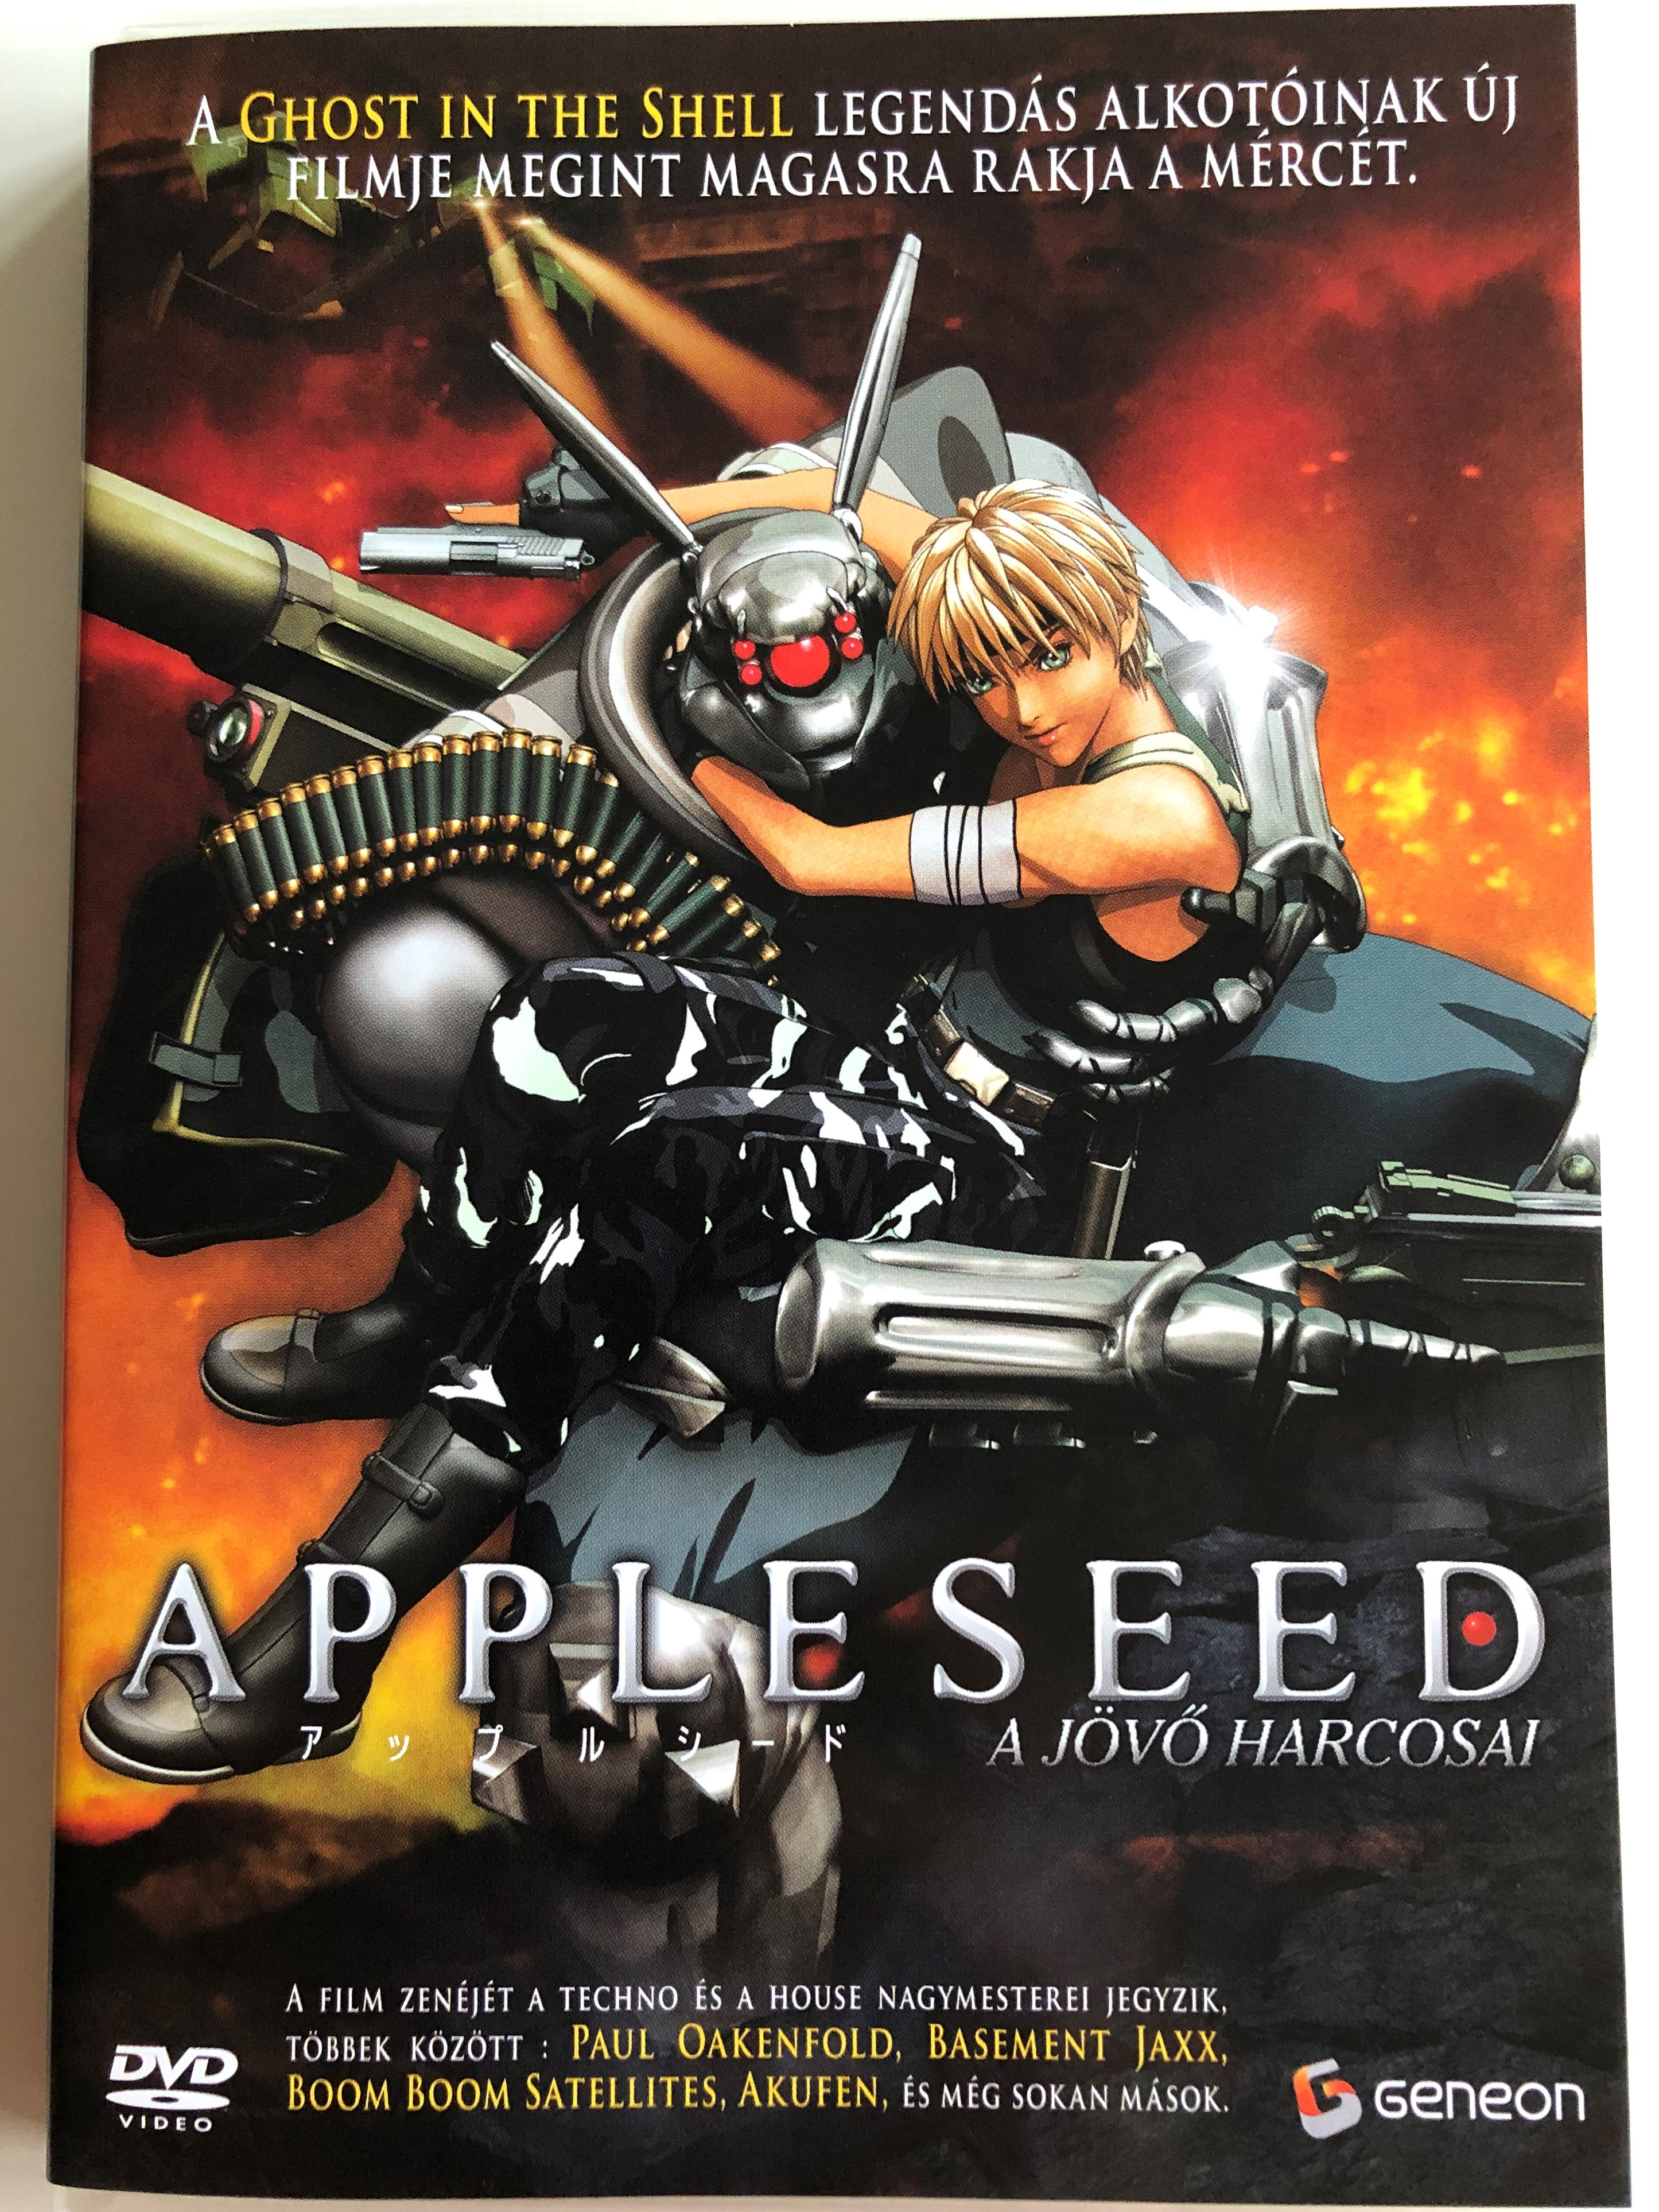 appleseed-dvd-2004-a-j-v-harcosai-directed-by-shinji-aramaki-1.jpg